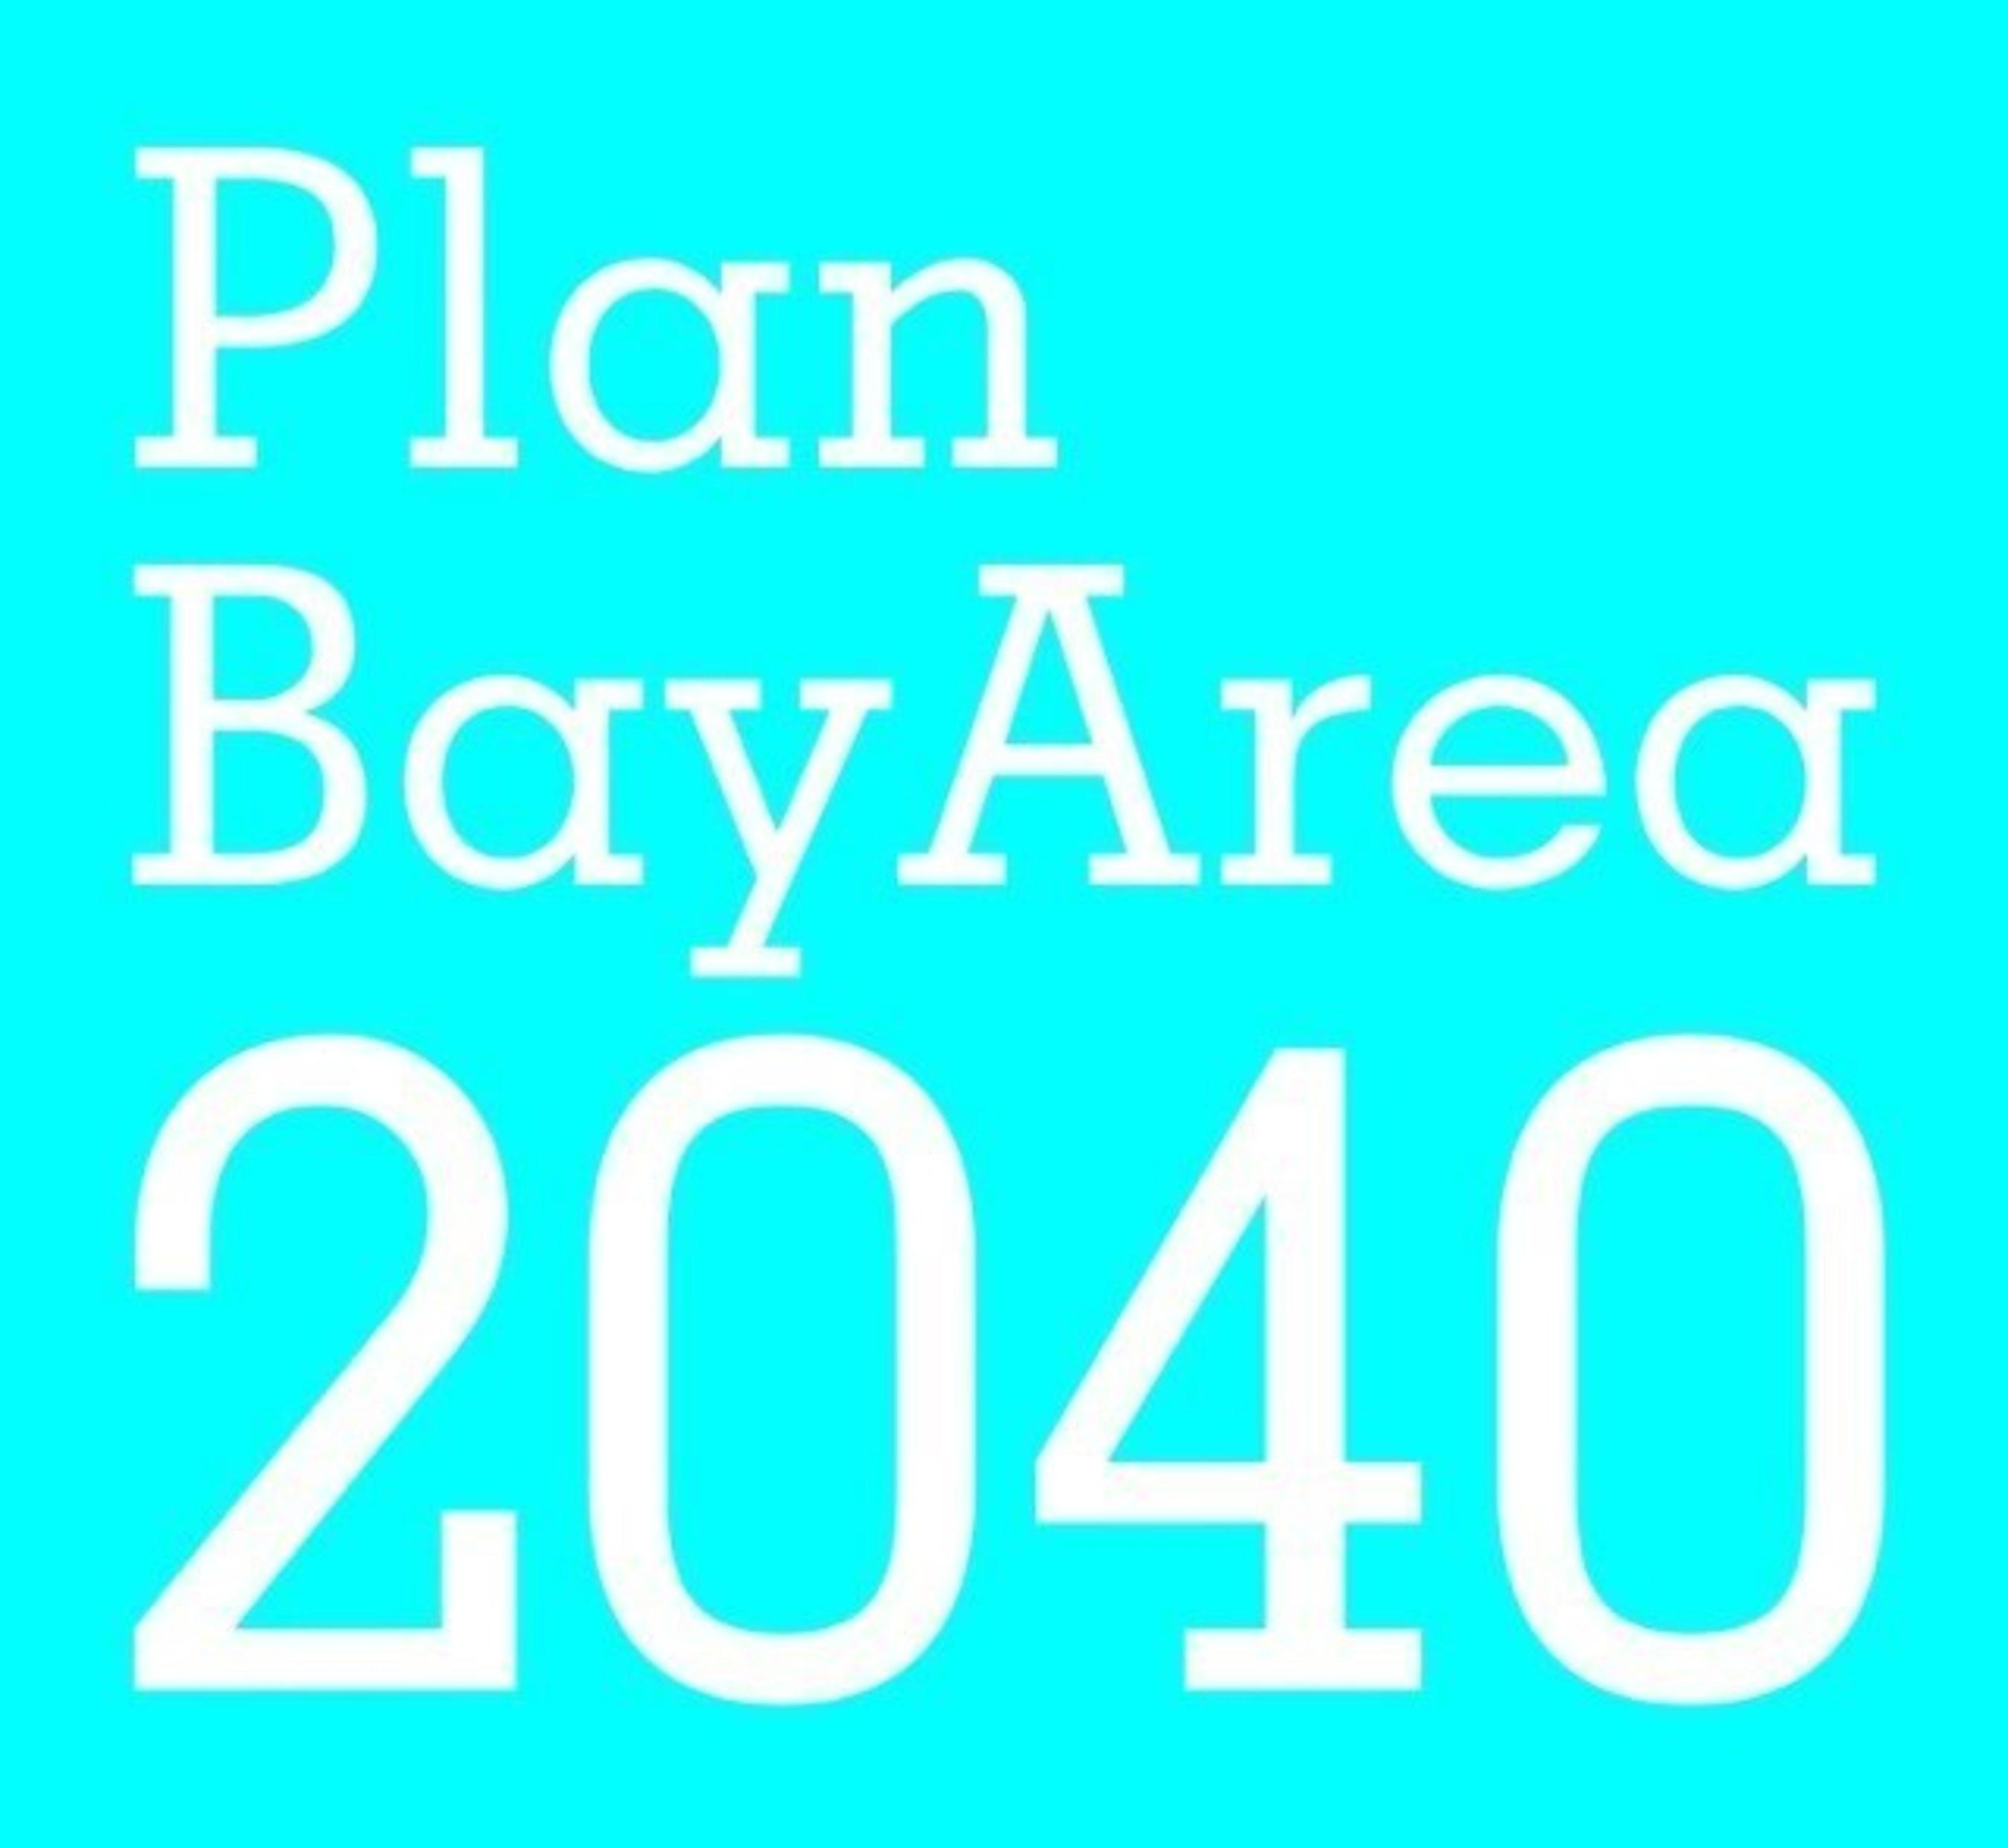 Plan Bay Area 2040 Logo